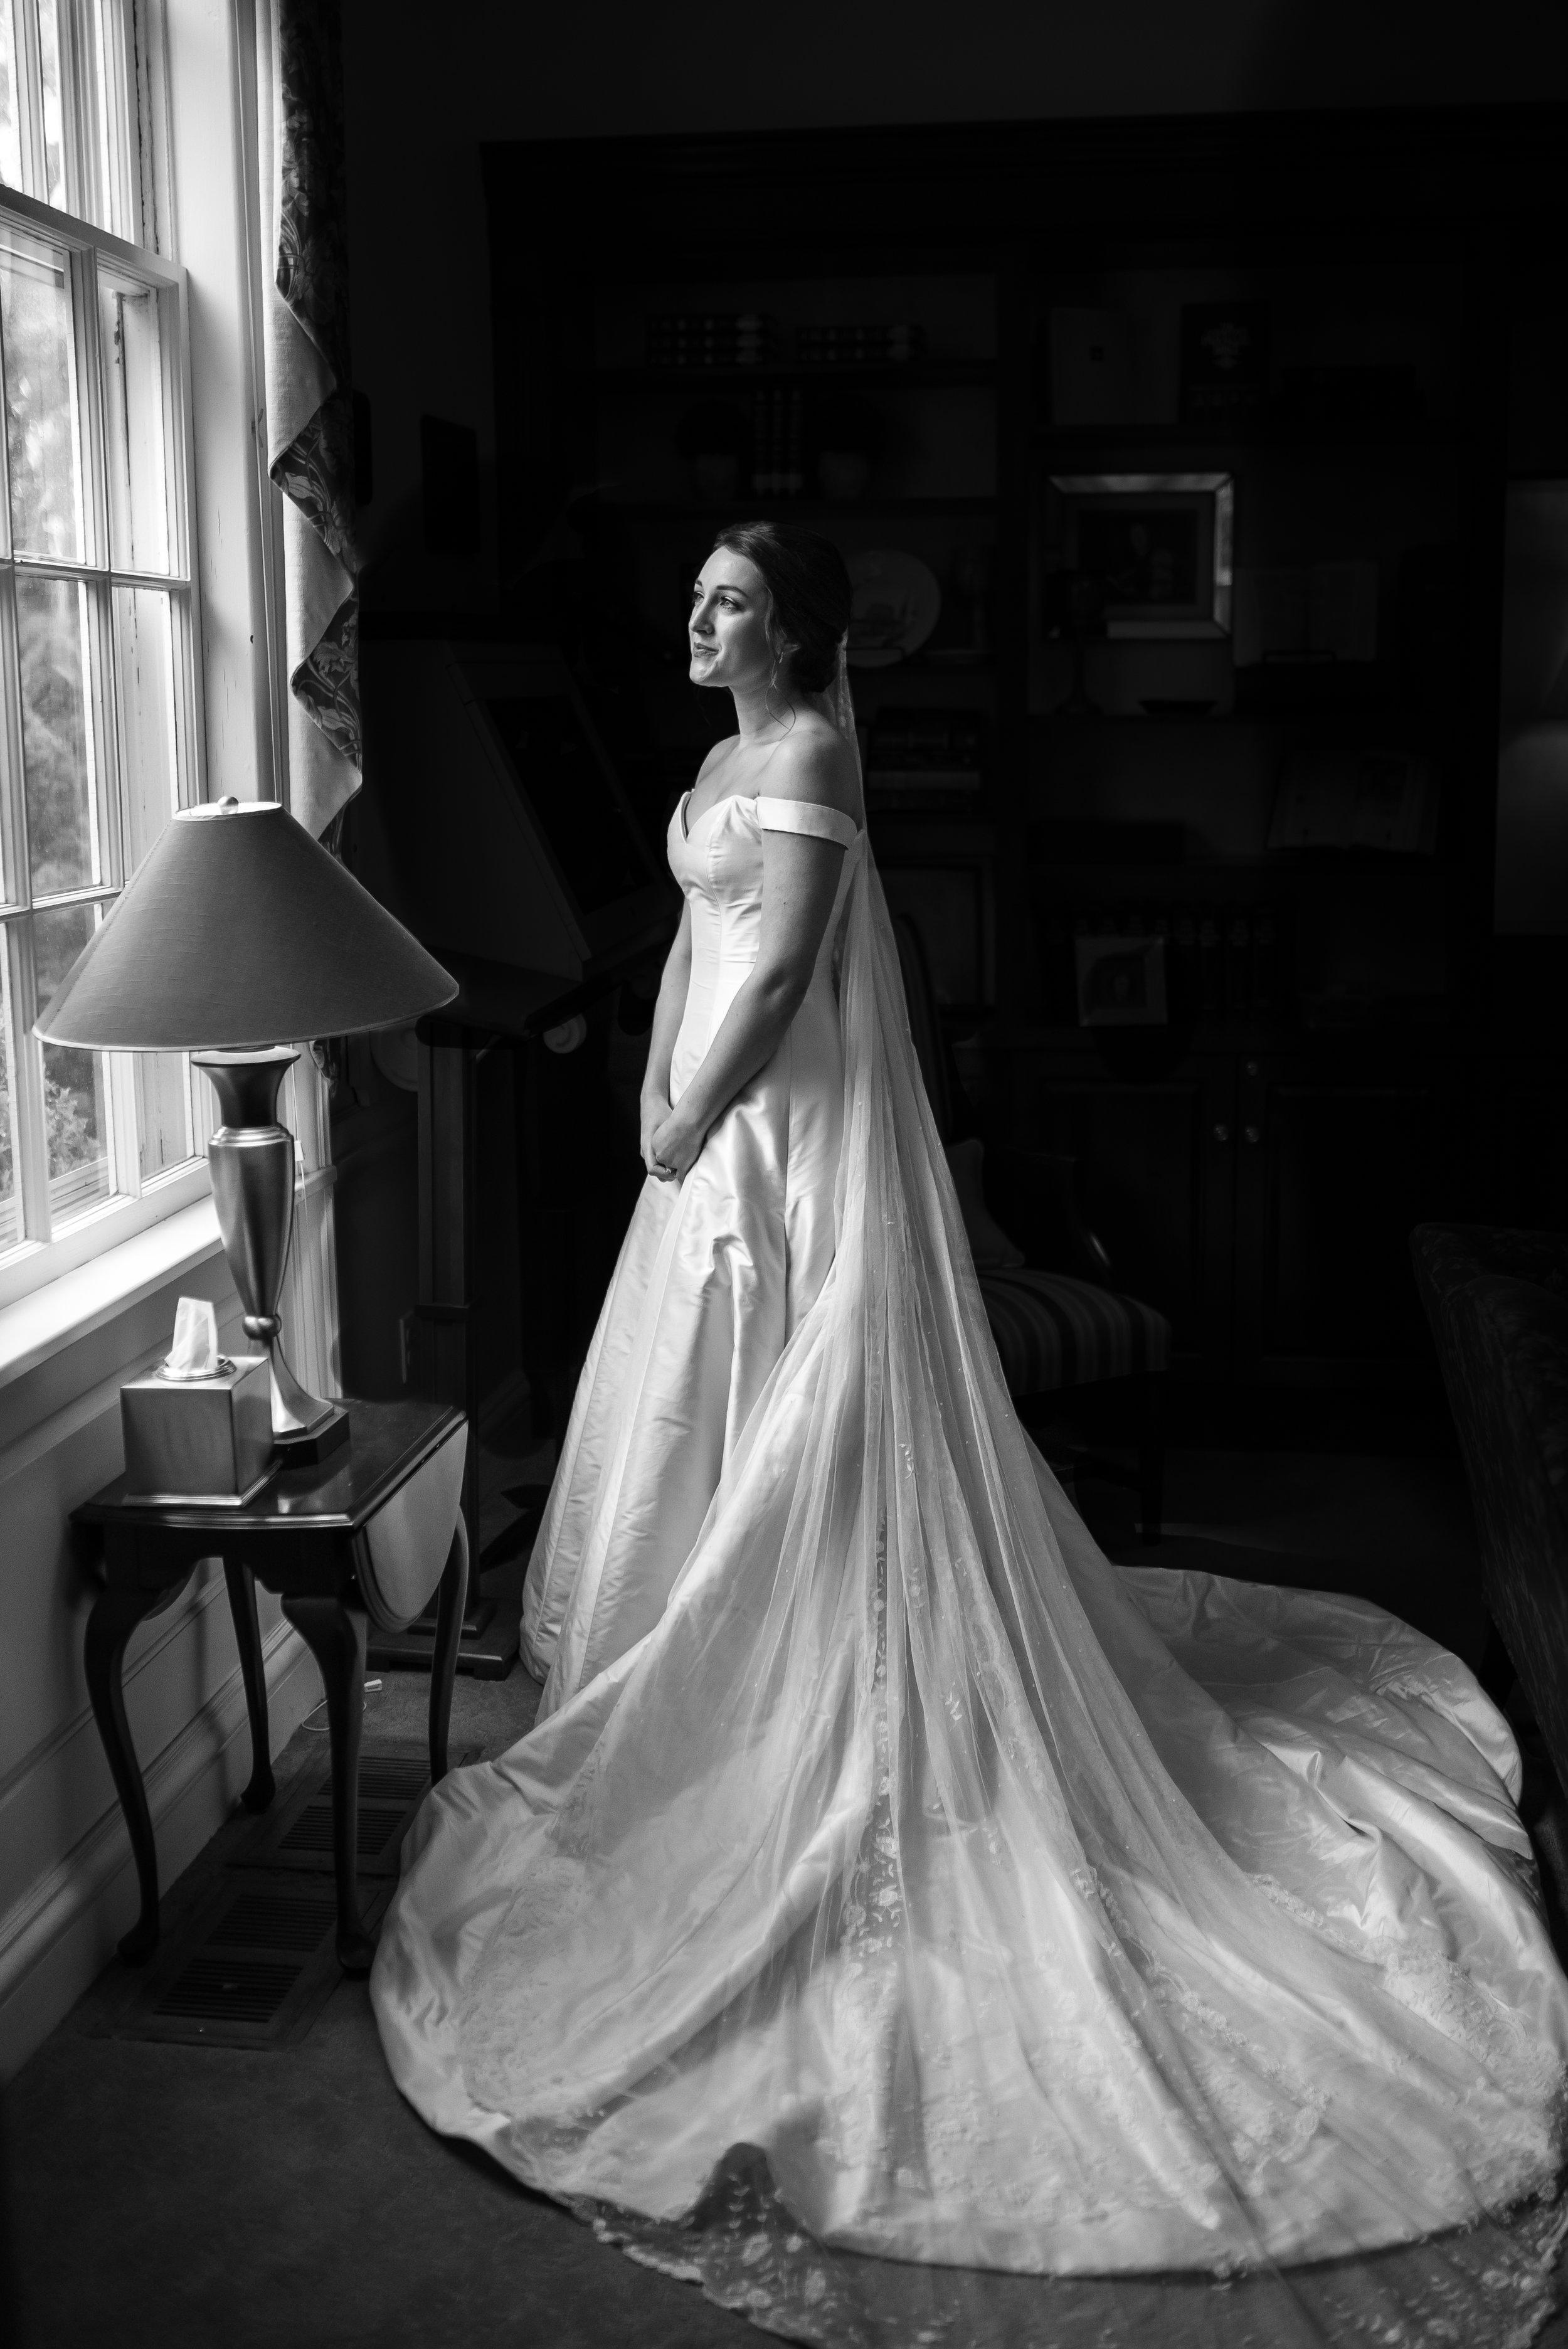 Jeremie_Barlow_Photography_Steffen_Sudyam_wedding_2018-420.jpg